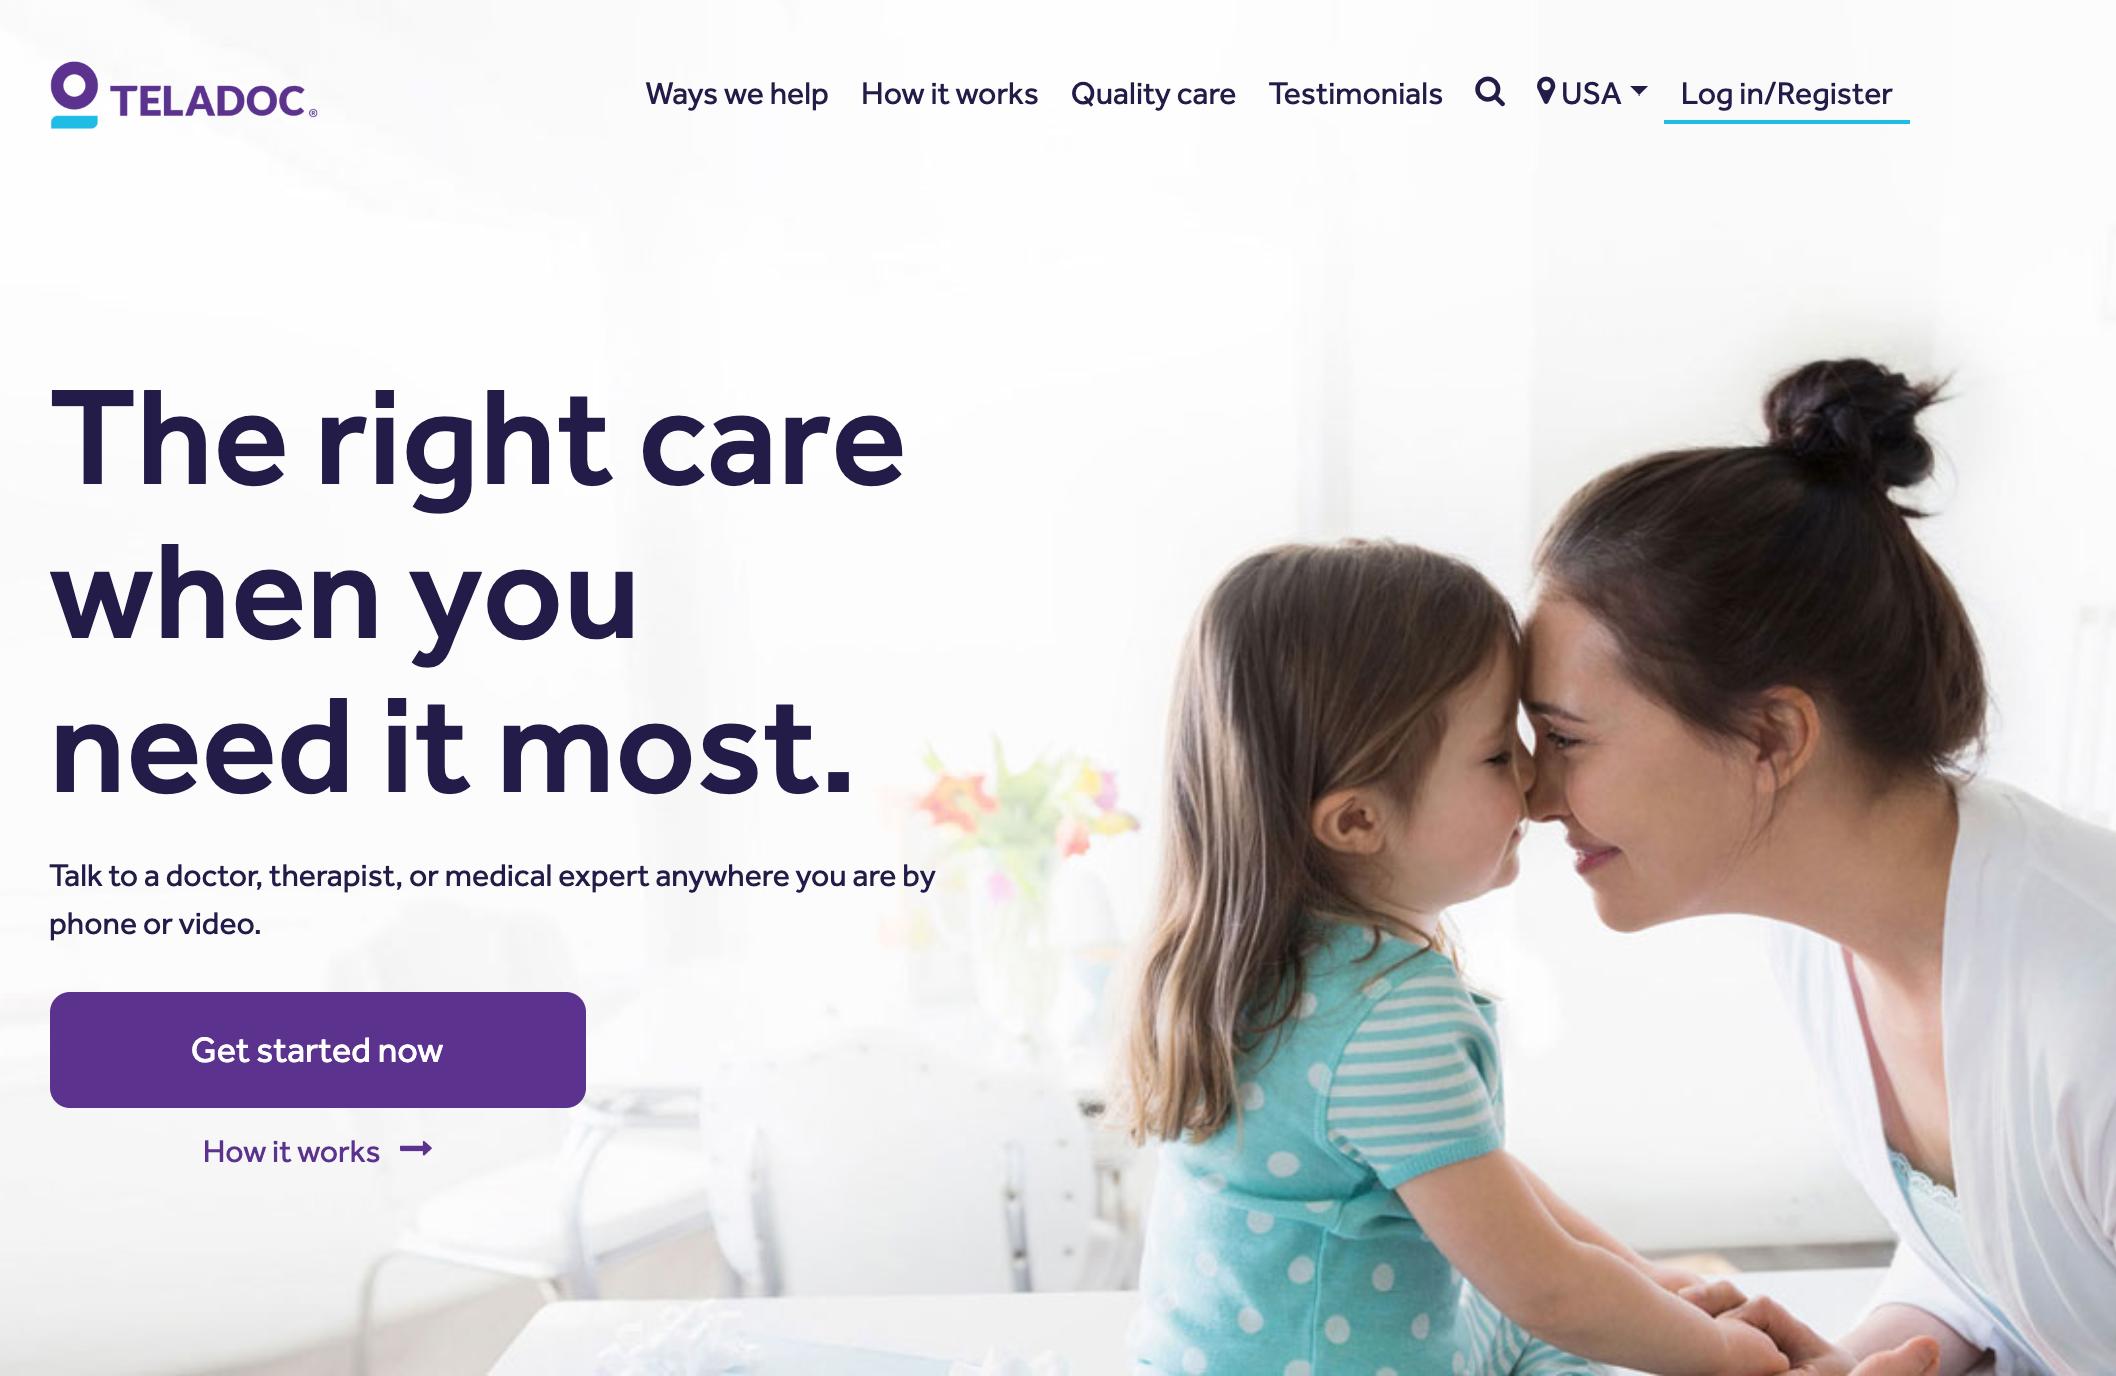 Teladoc.com